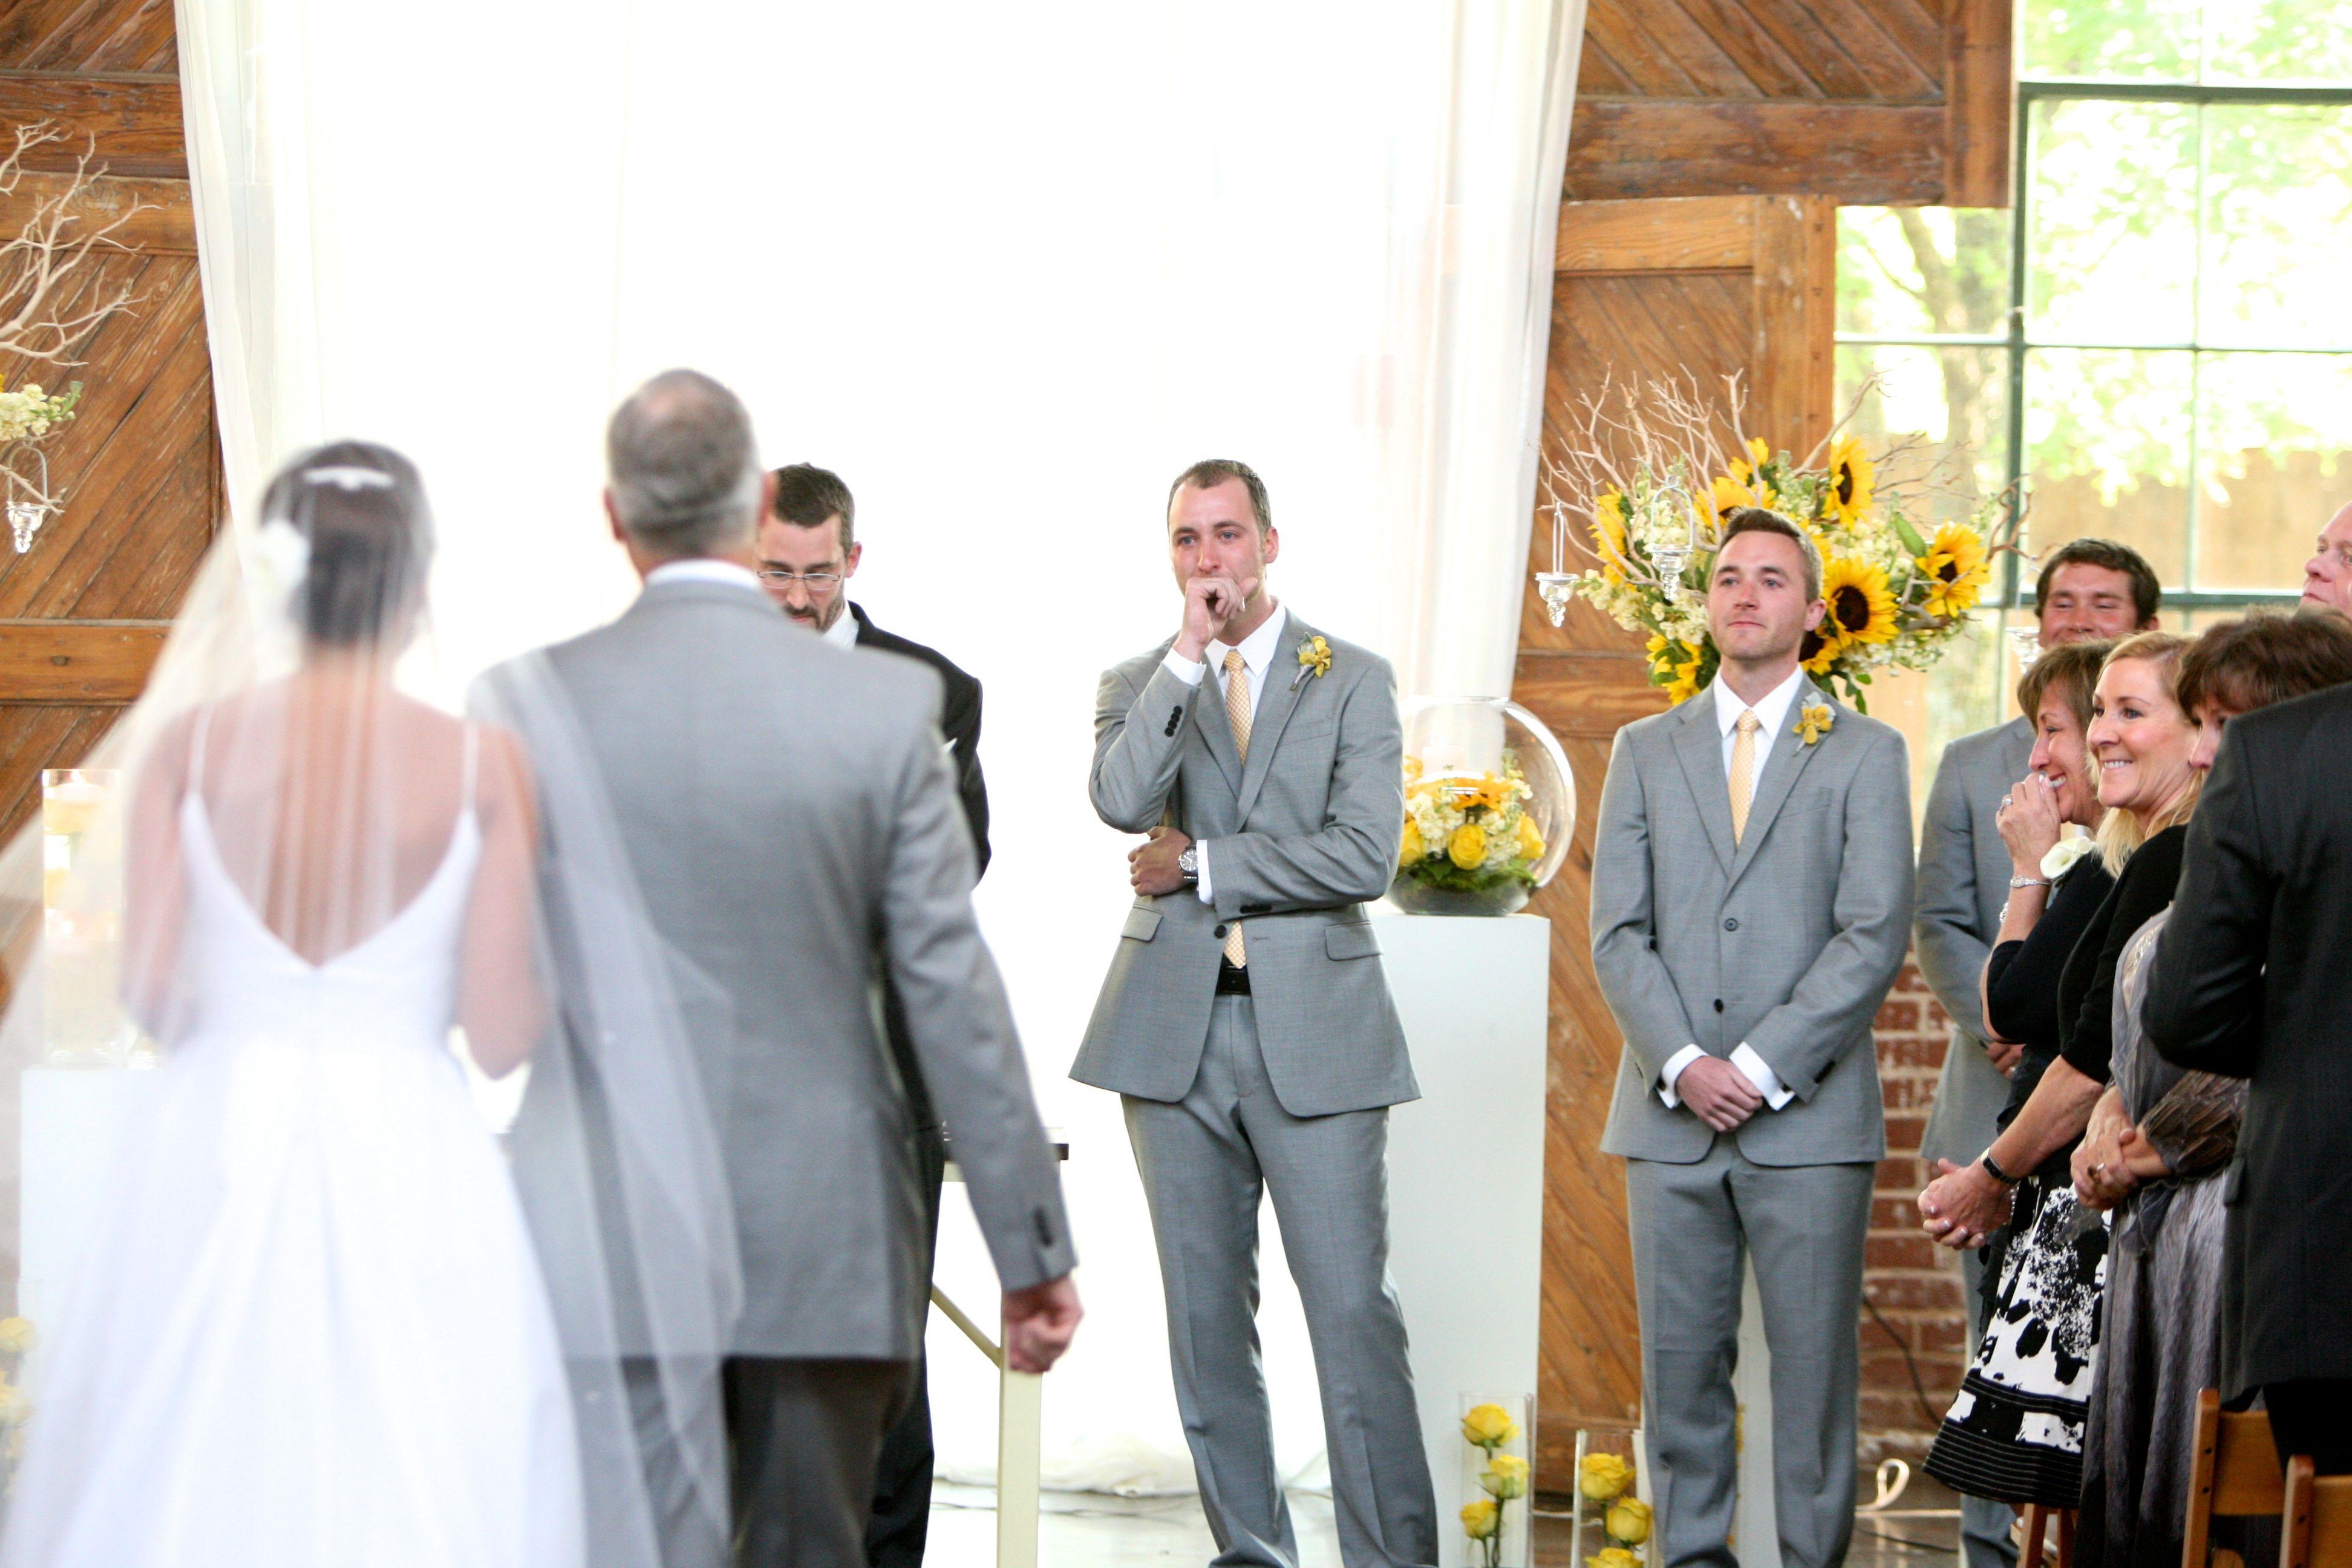 Groom reaction, wedding, walking down the aisle, groom crying